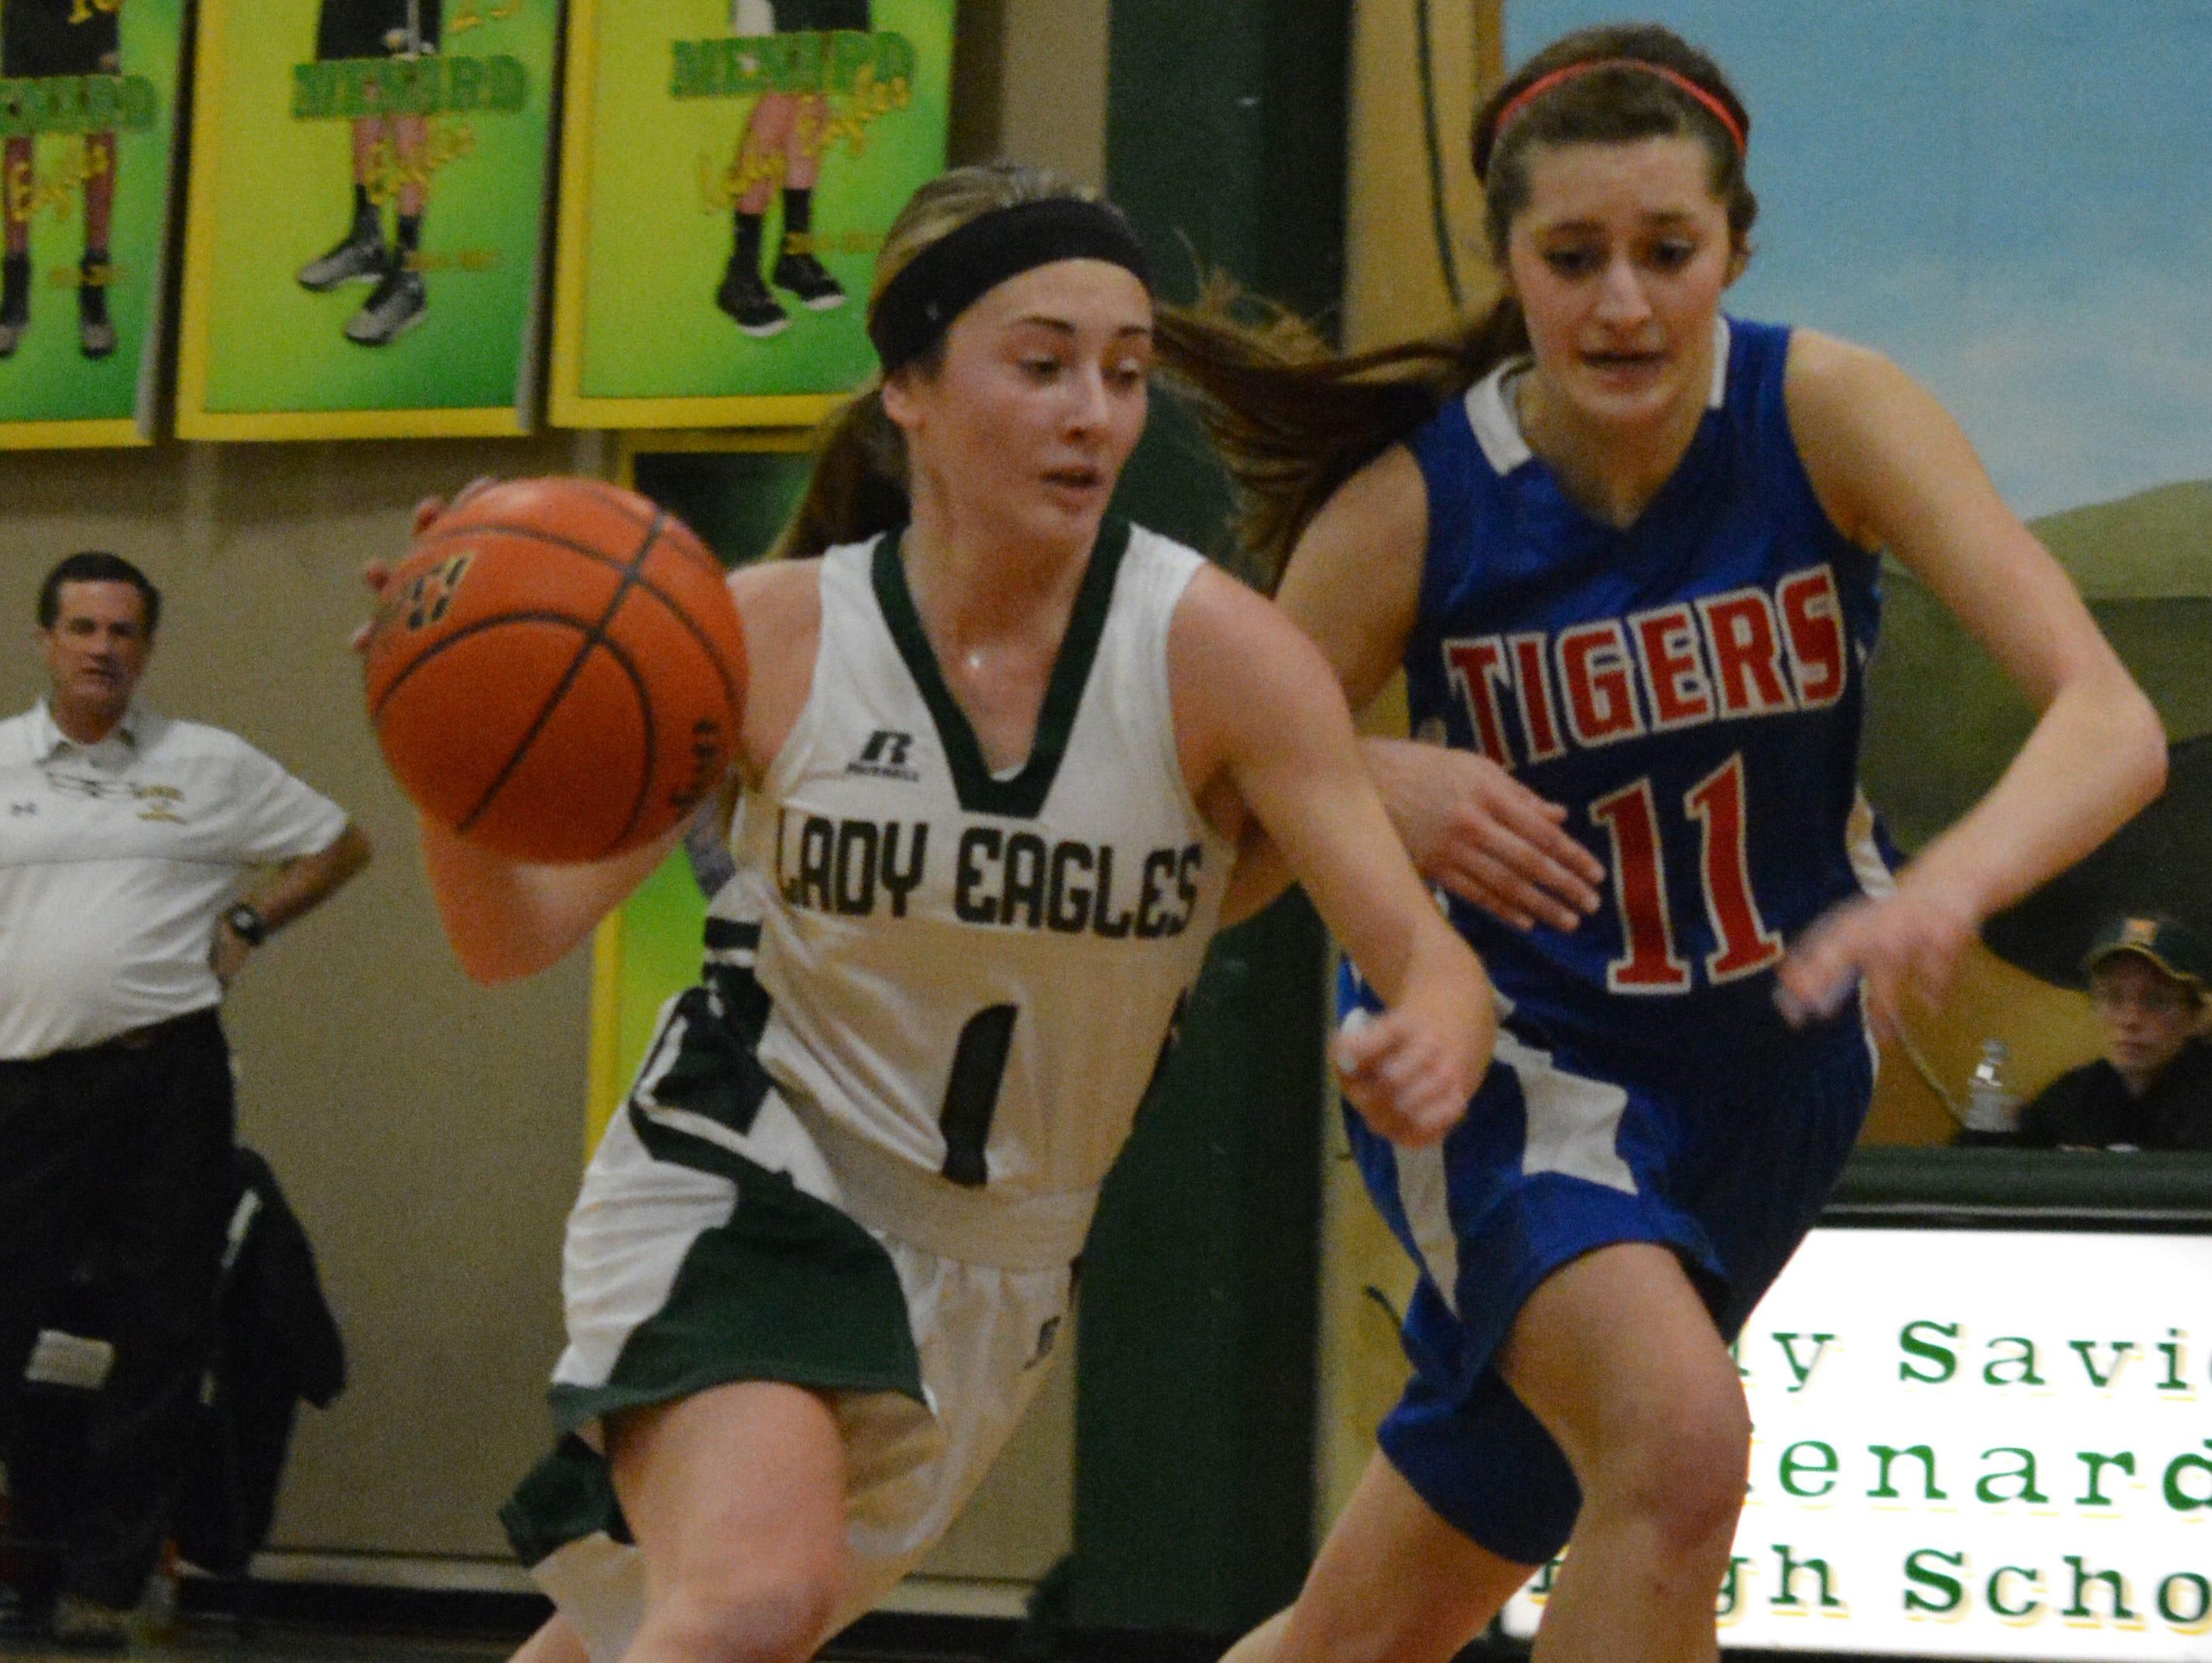 Menard's Morgan Woodard (1, left) drives to the basket against Lake Arthur's Kaitlyn Trahan (11, right) Tuesday, Feb. 24, 2015.